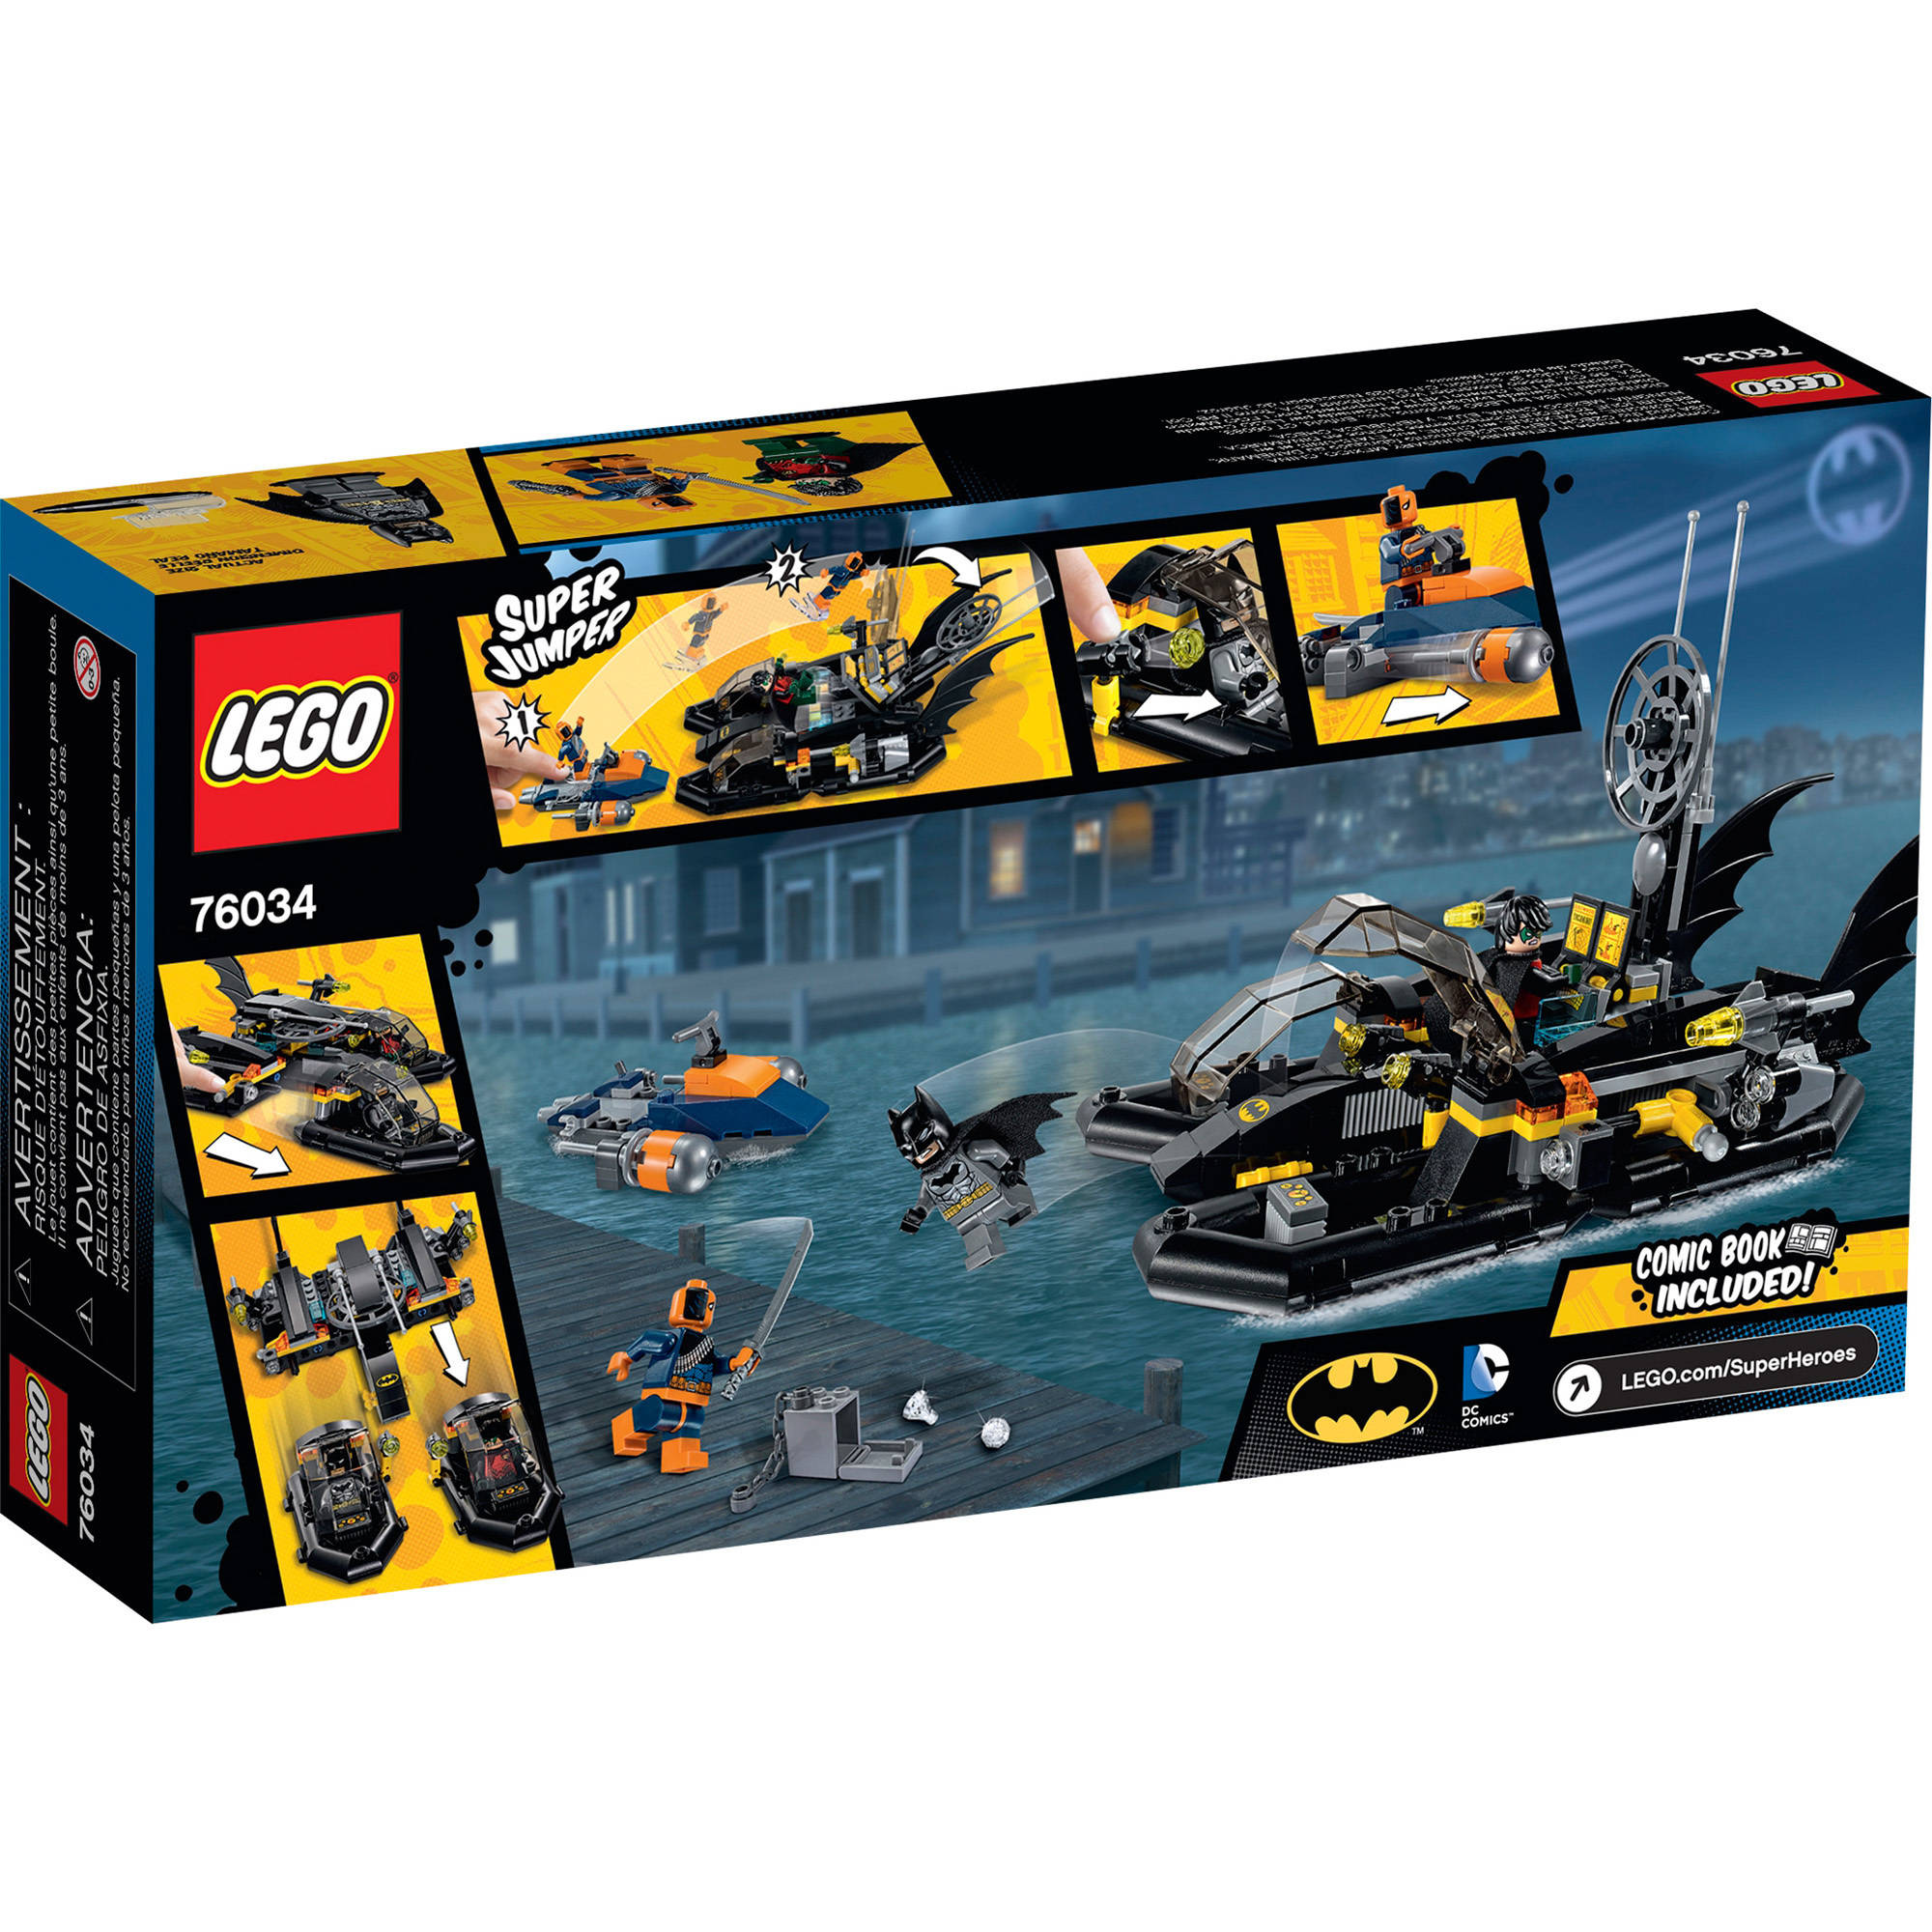 Lego Harbor Super The Batboat Heroes Pursuit76034 7bYgyfI6v